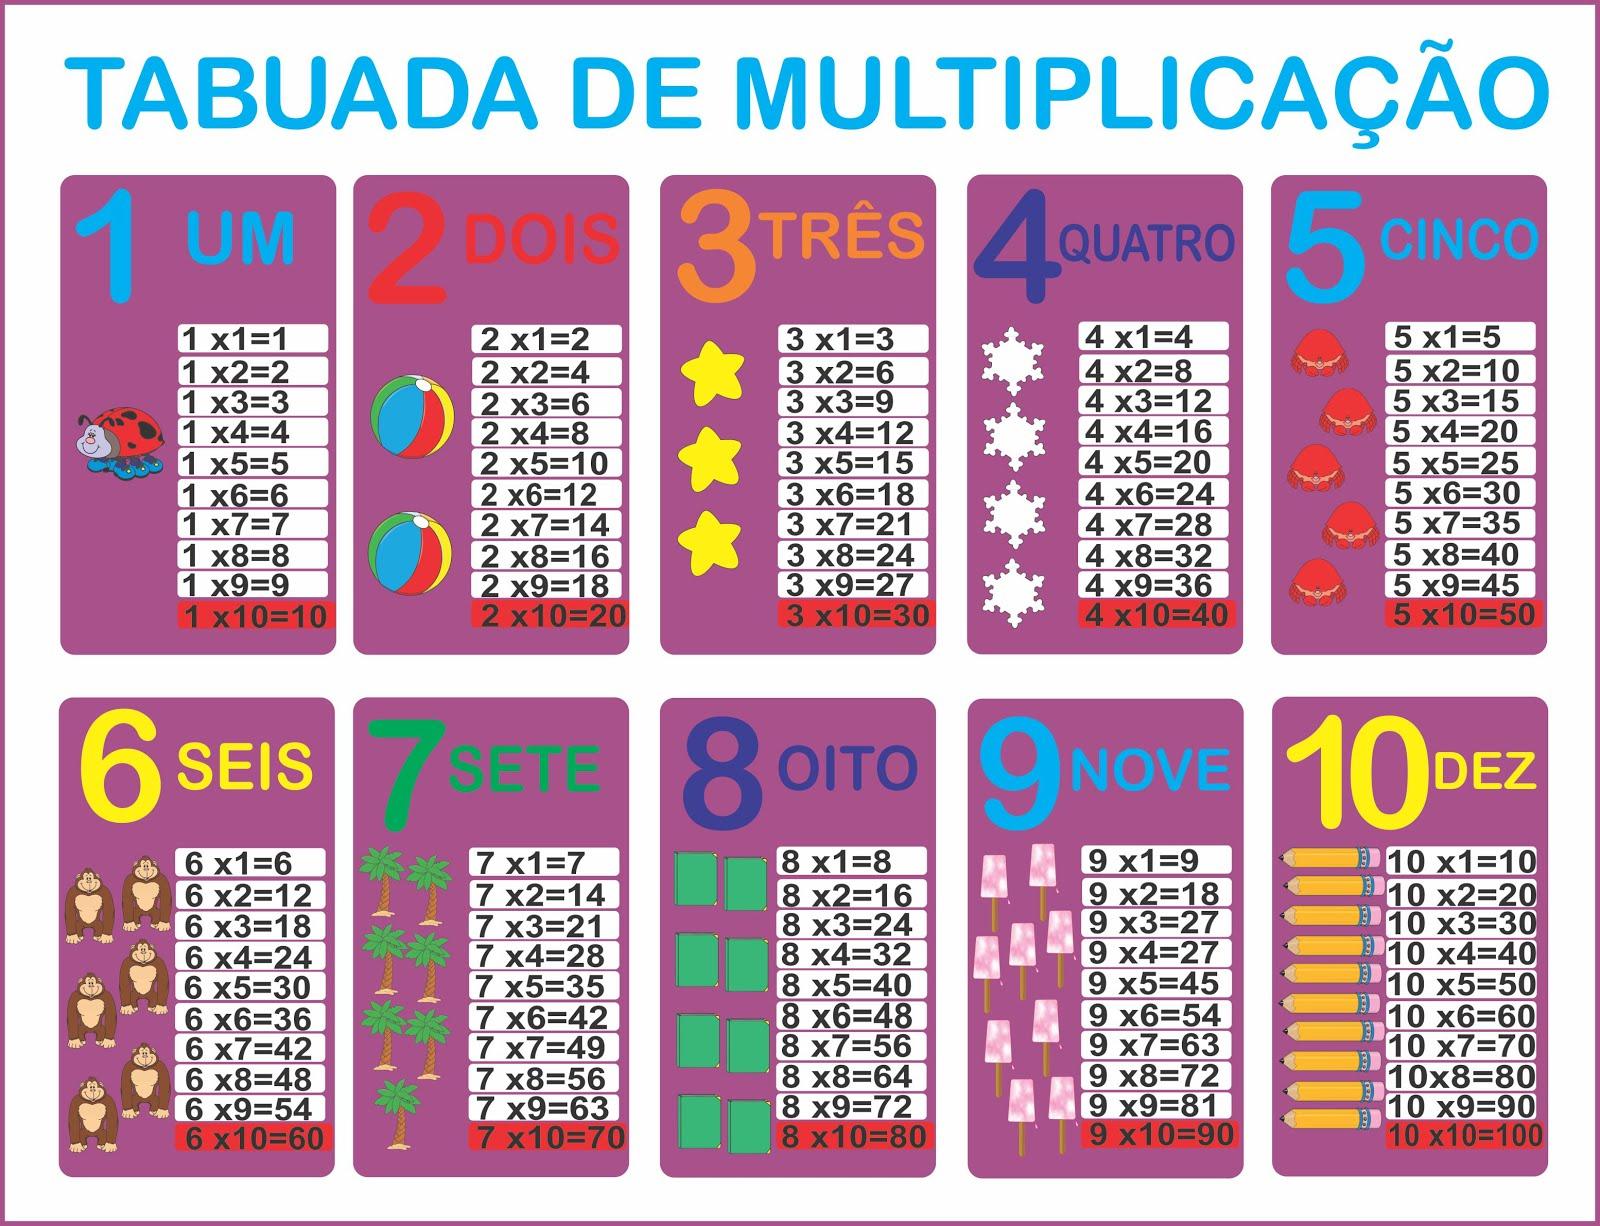 Tabuada Para Imprimir Multiplicacao So Escola